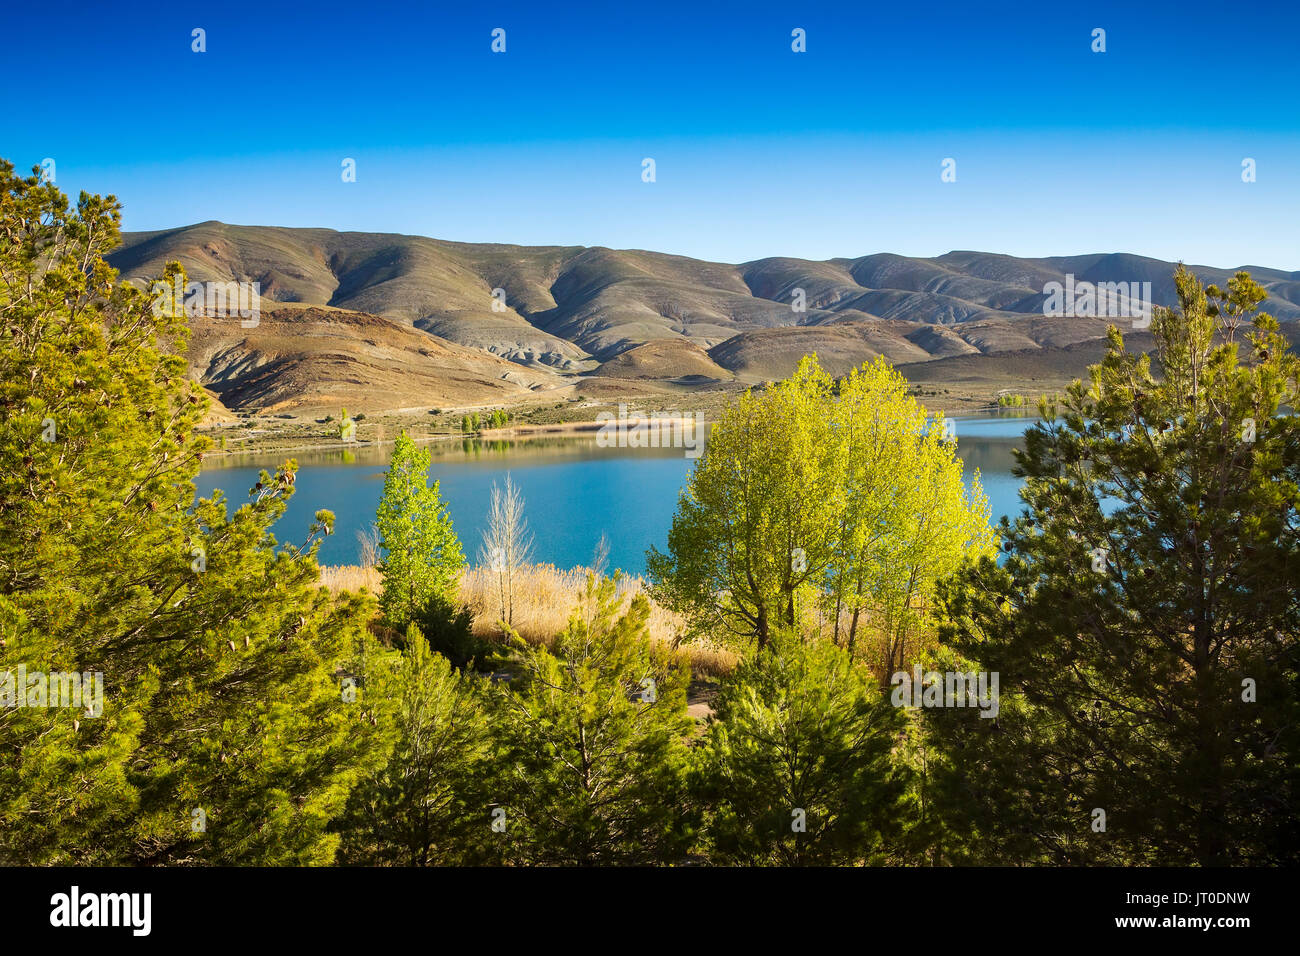 Blue Water See und Vegetation. Hohen Atlas. Marokko, Maghreb Nordafrika Stockbild